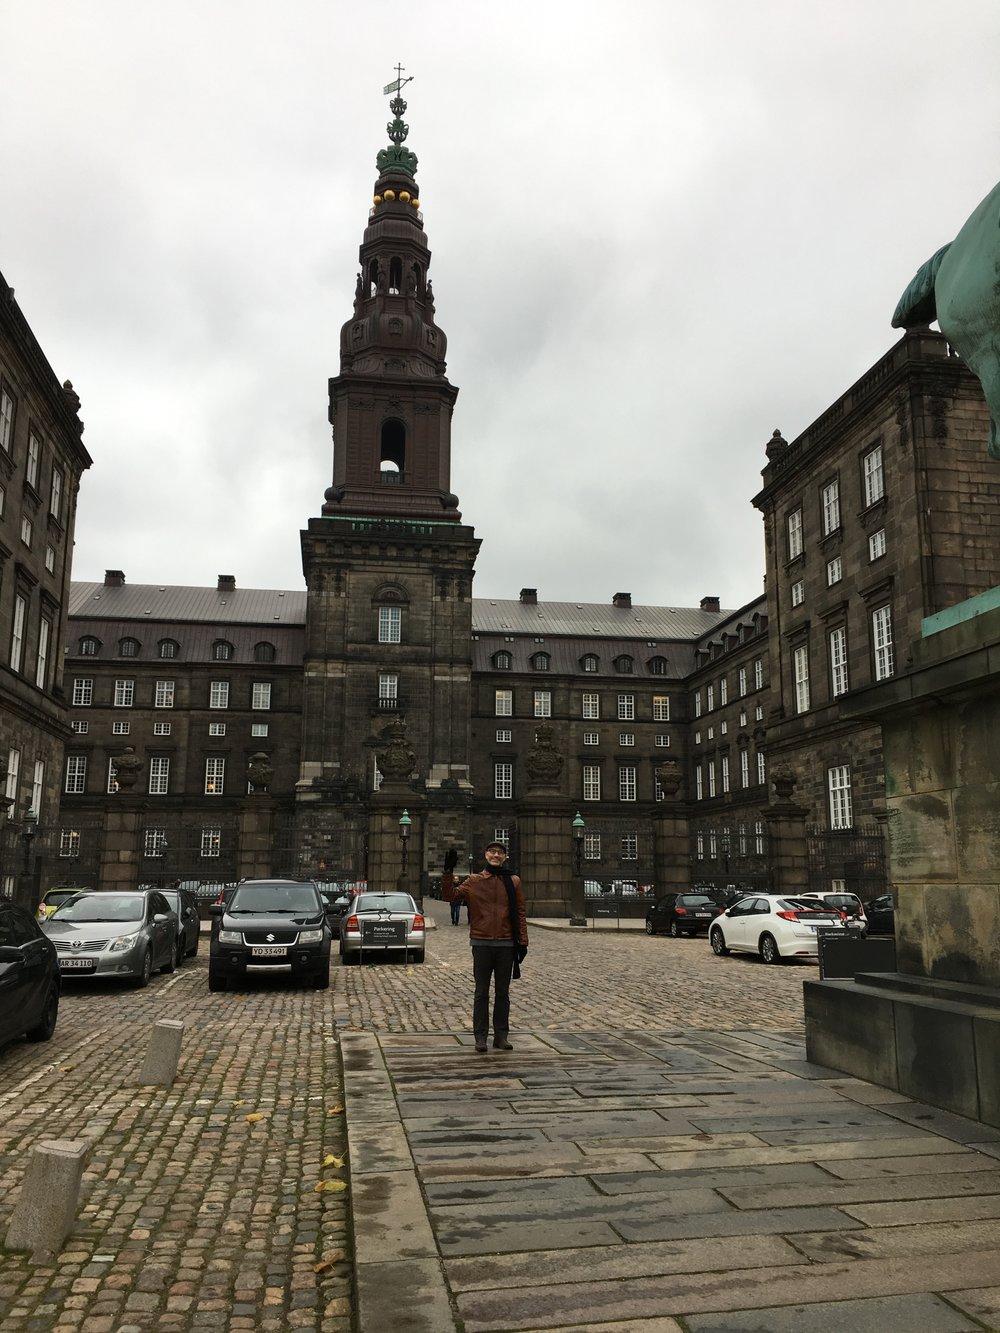 Danish National Parliament